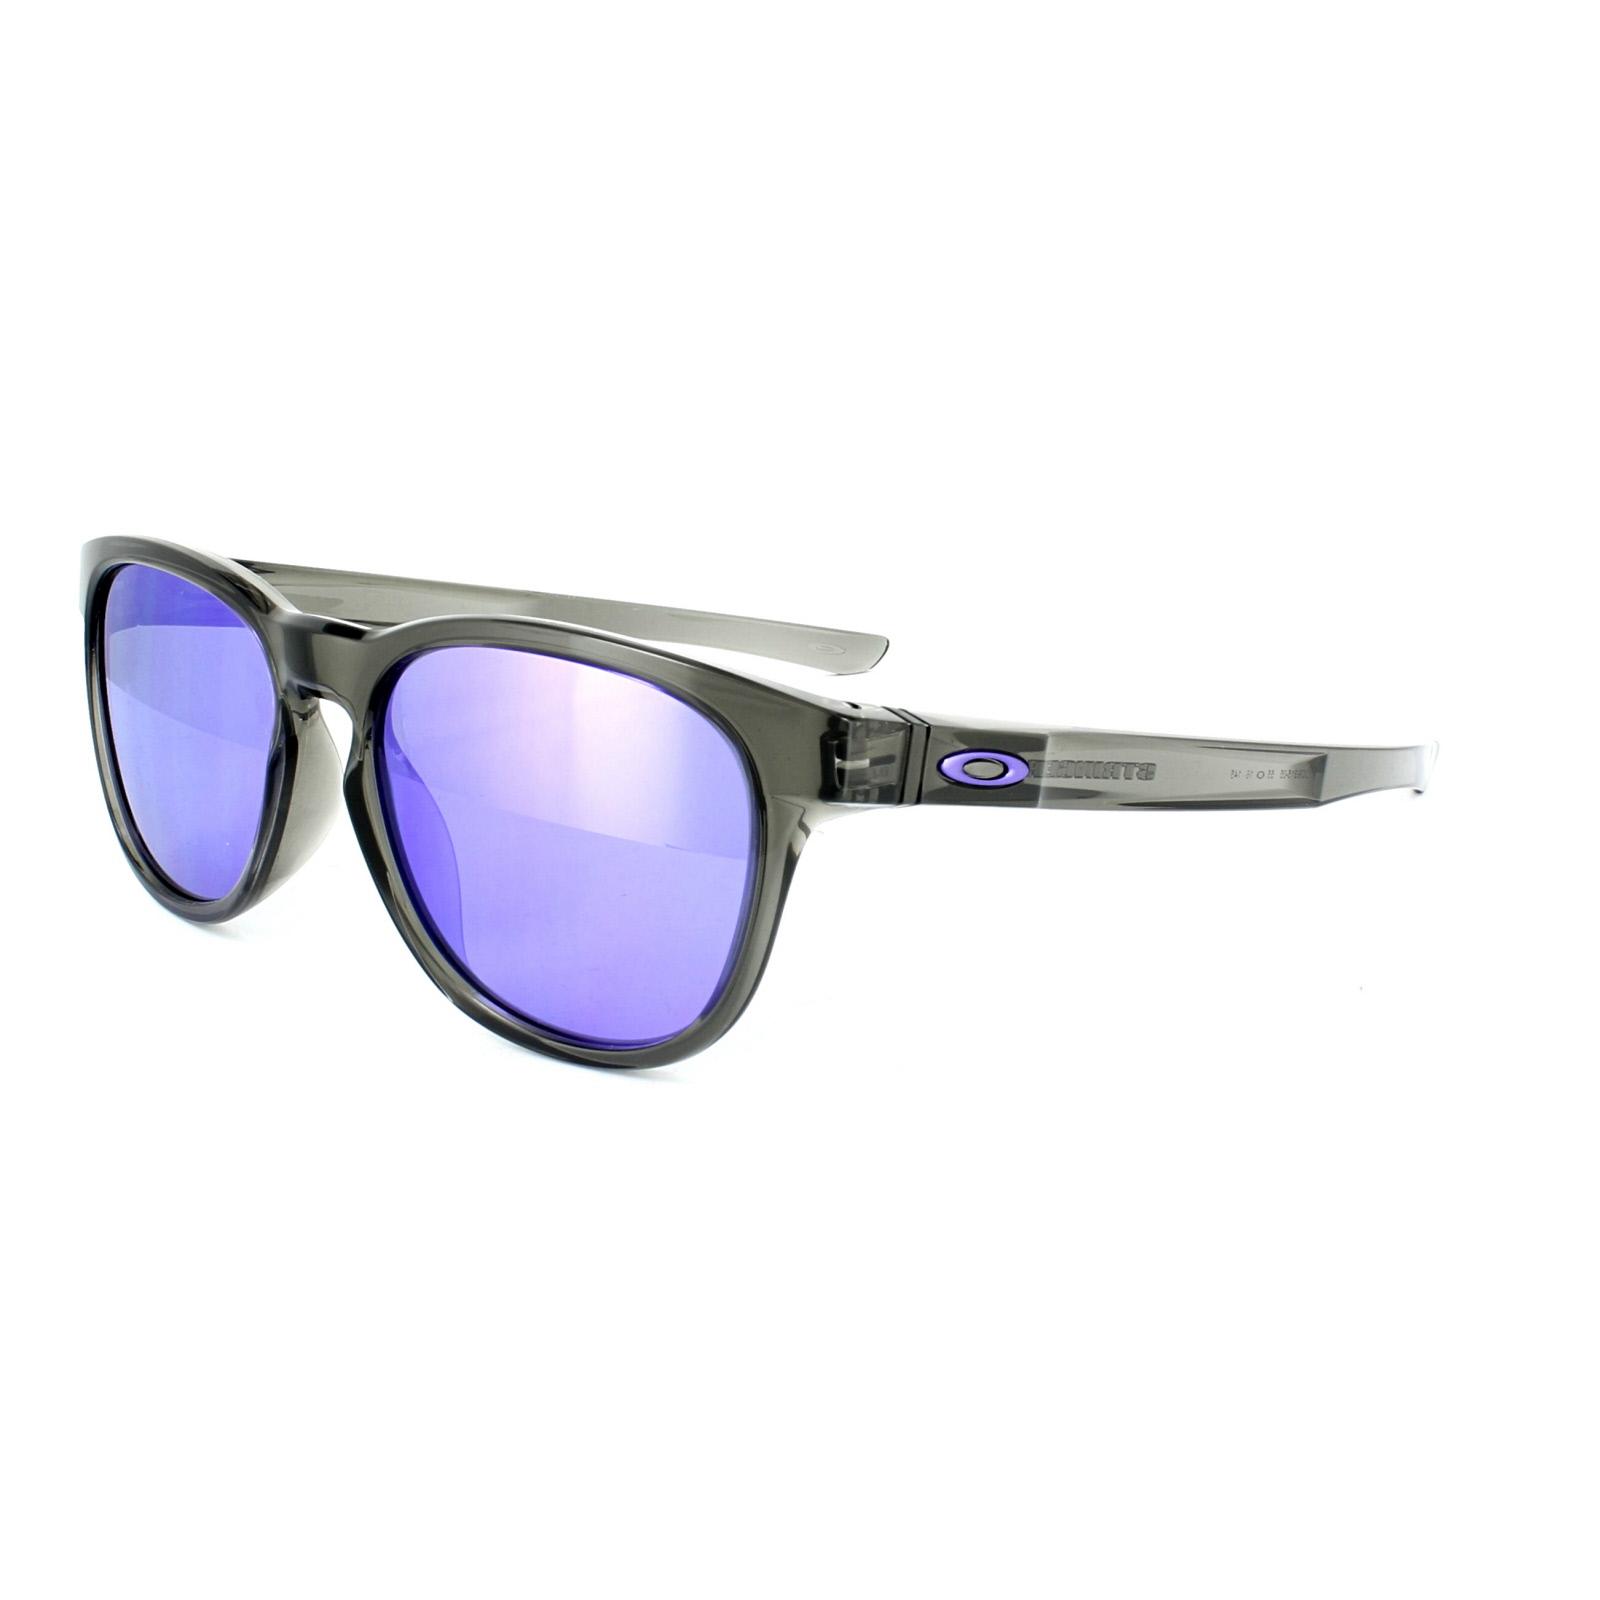 Oakley Sonnenbrille Stringer Violet Iridium Gray Smoke 8idBscYsP